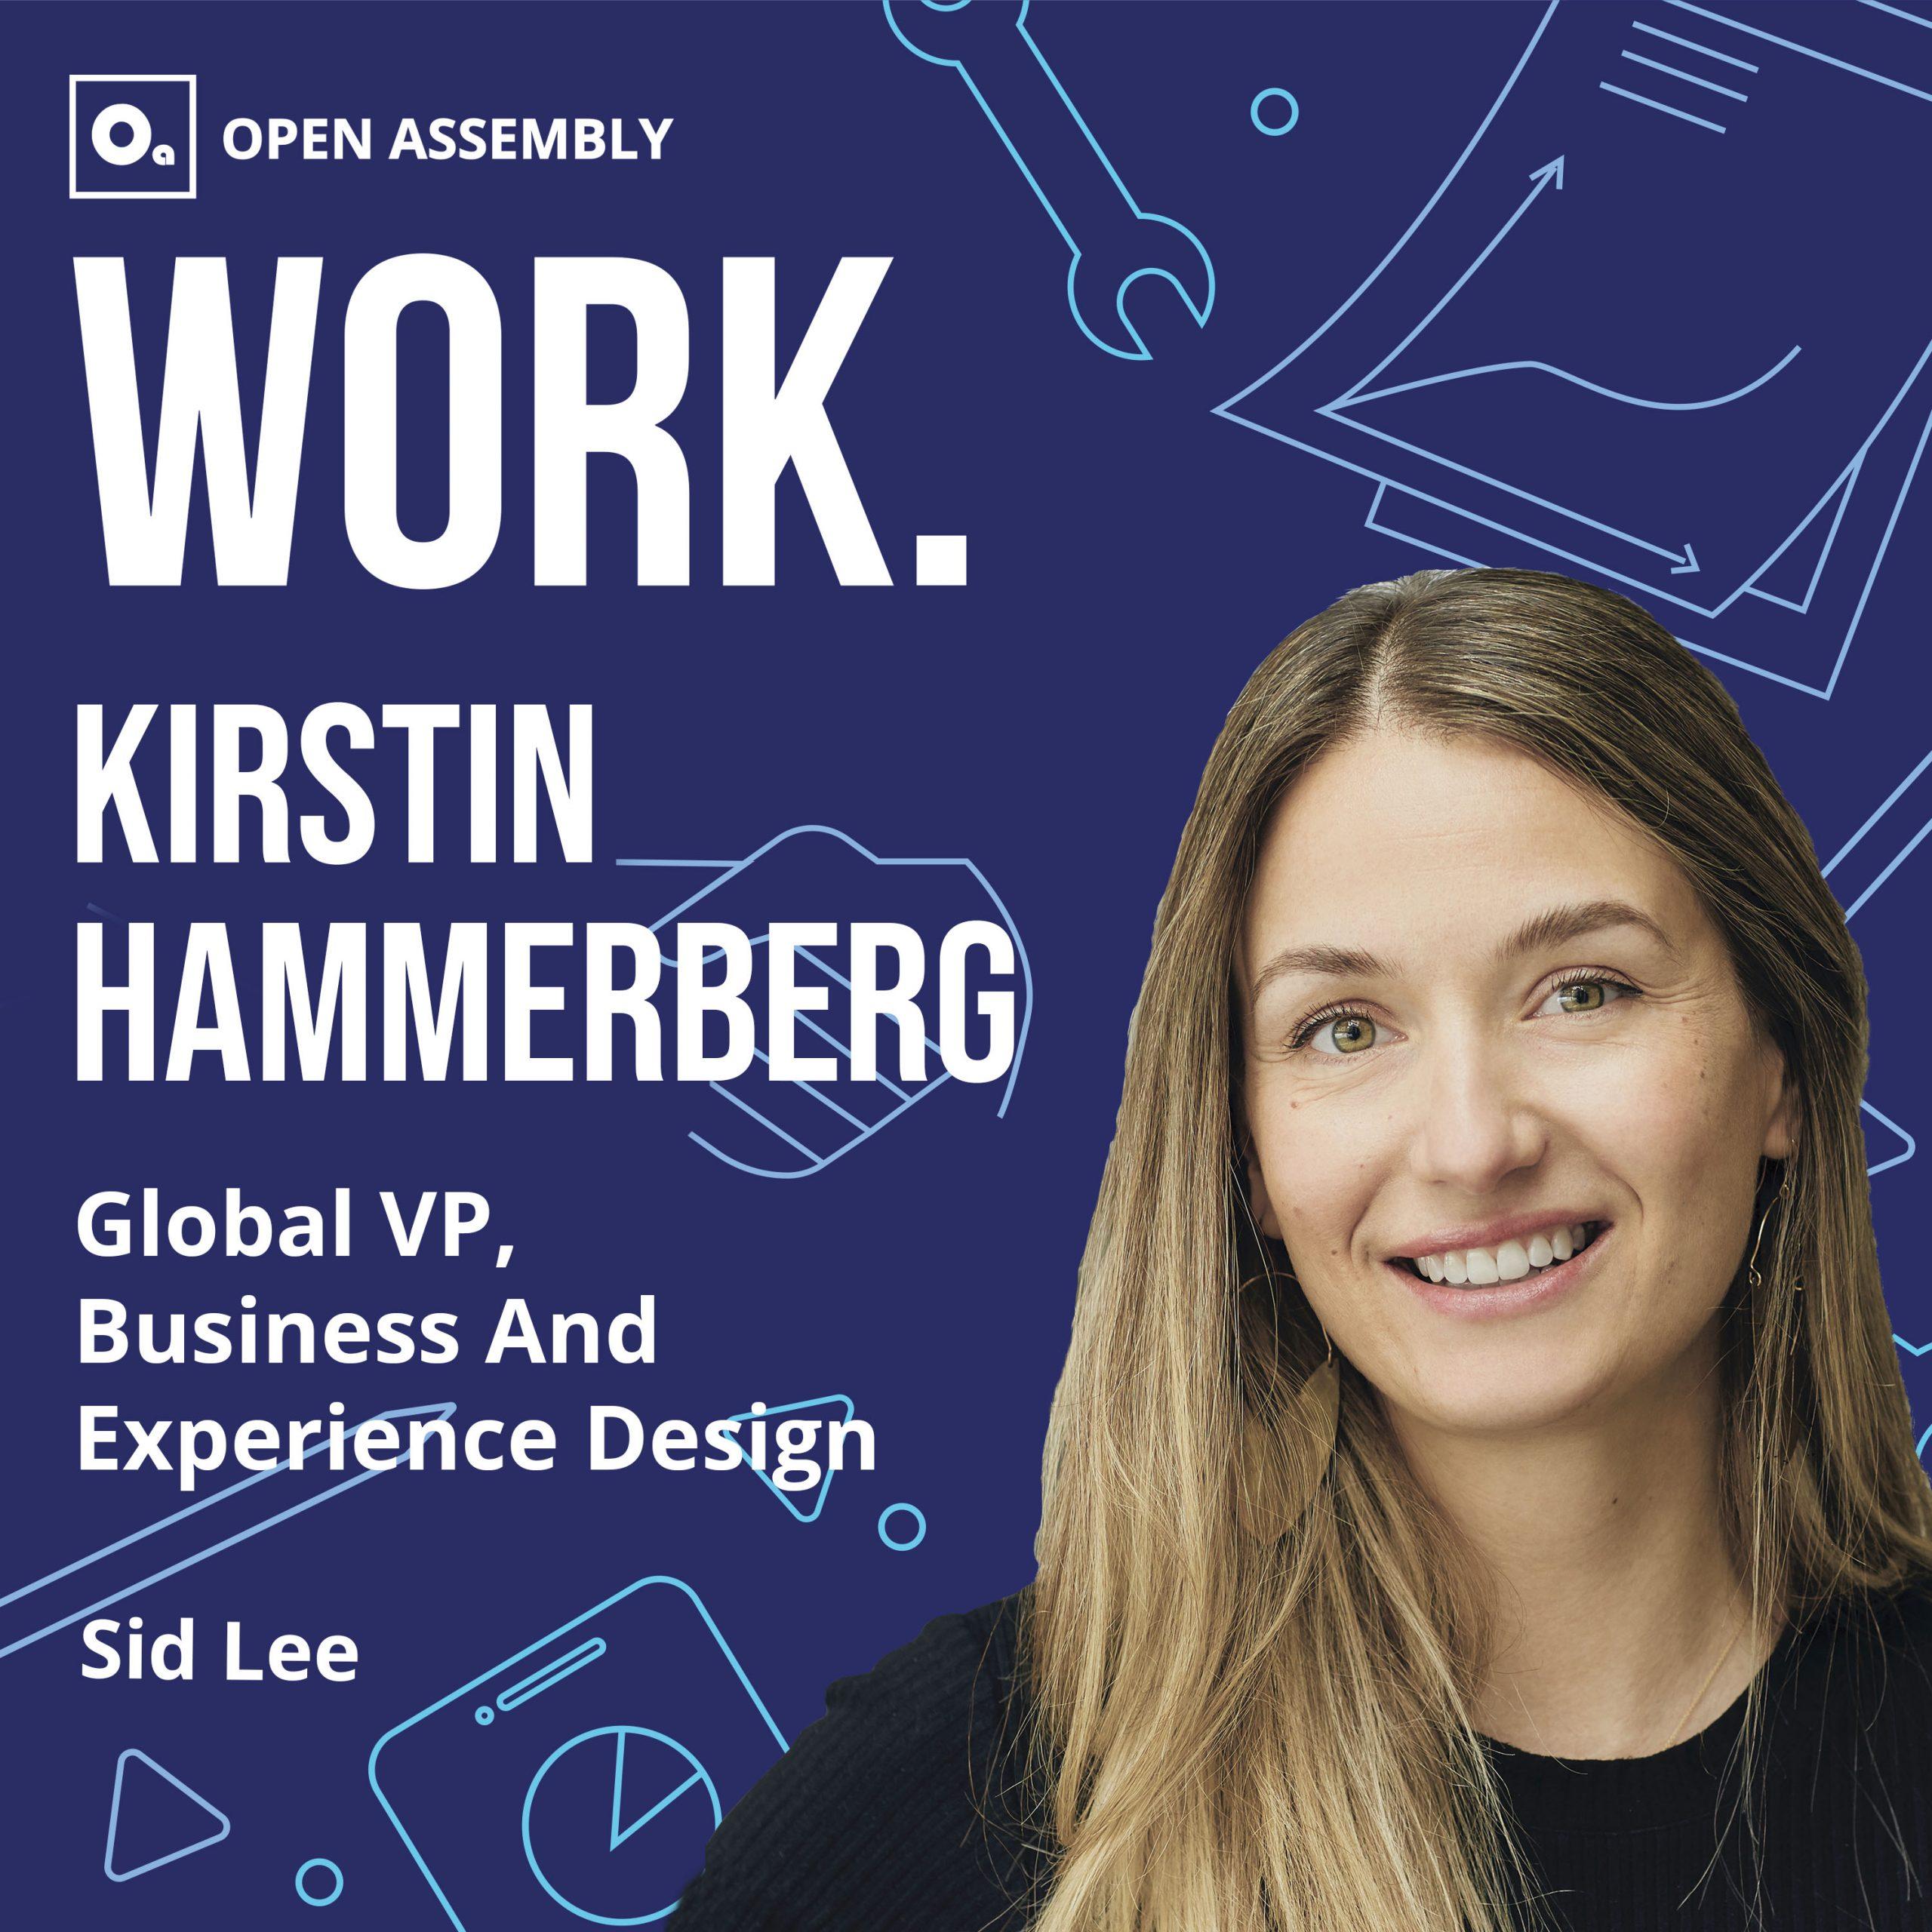 Kirstin Hammerberg - Sid Lee